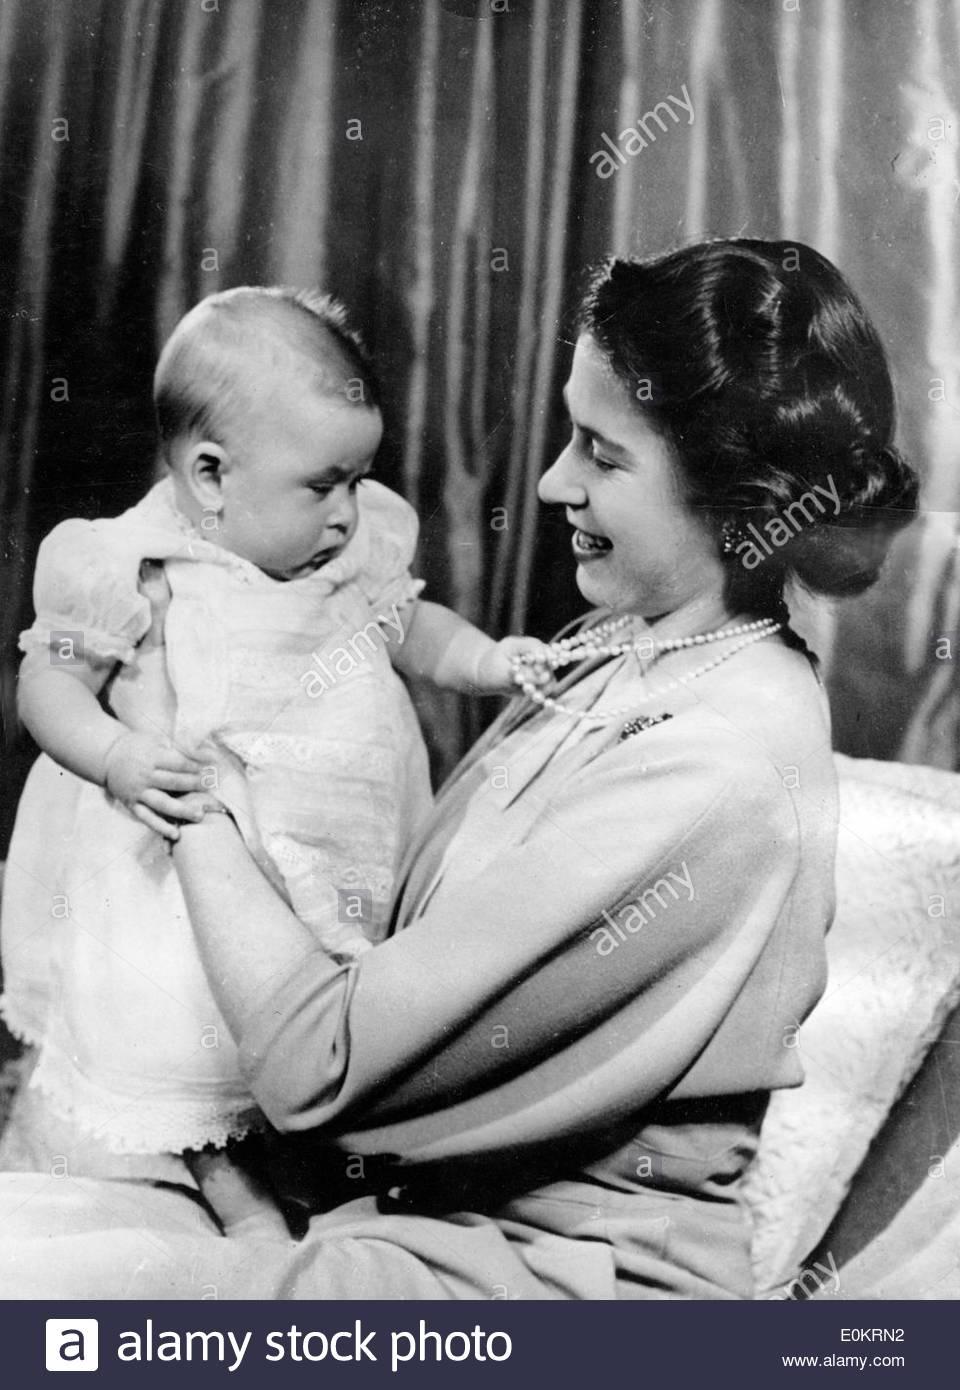 Queen Elizabeth II Holding Baby Prince Charles Stock Photo 69277182 Alamy